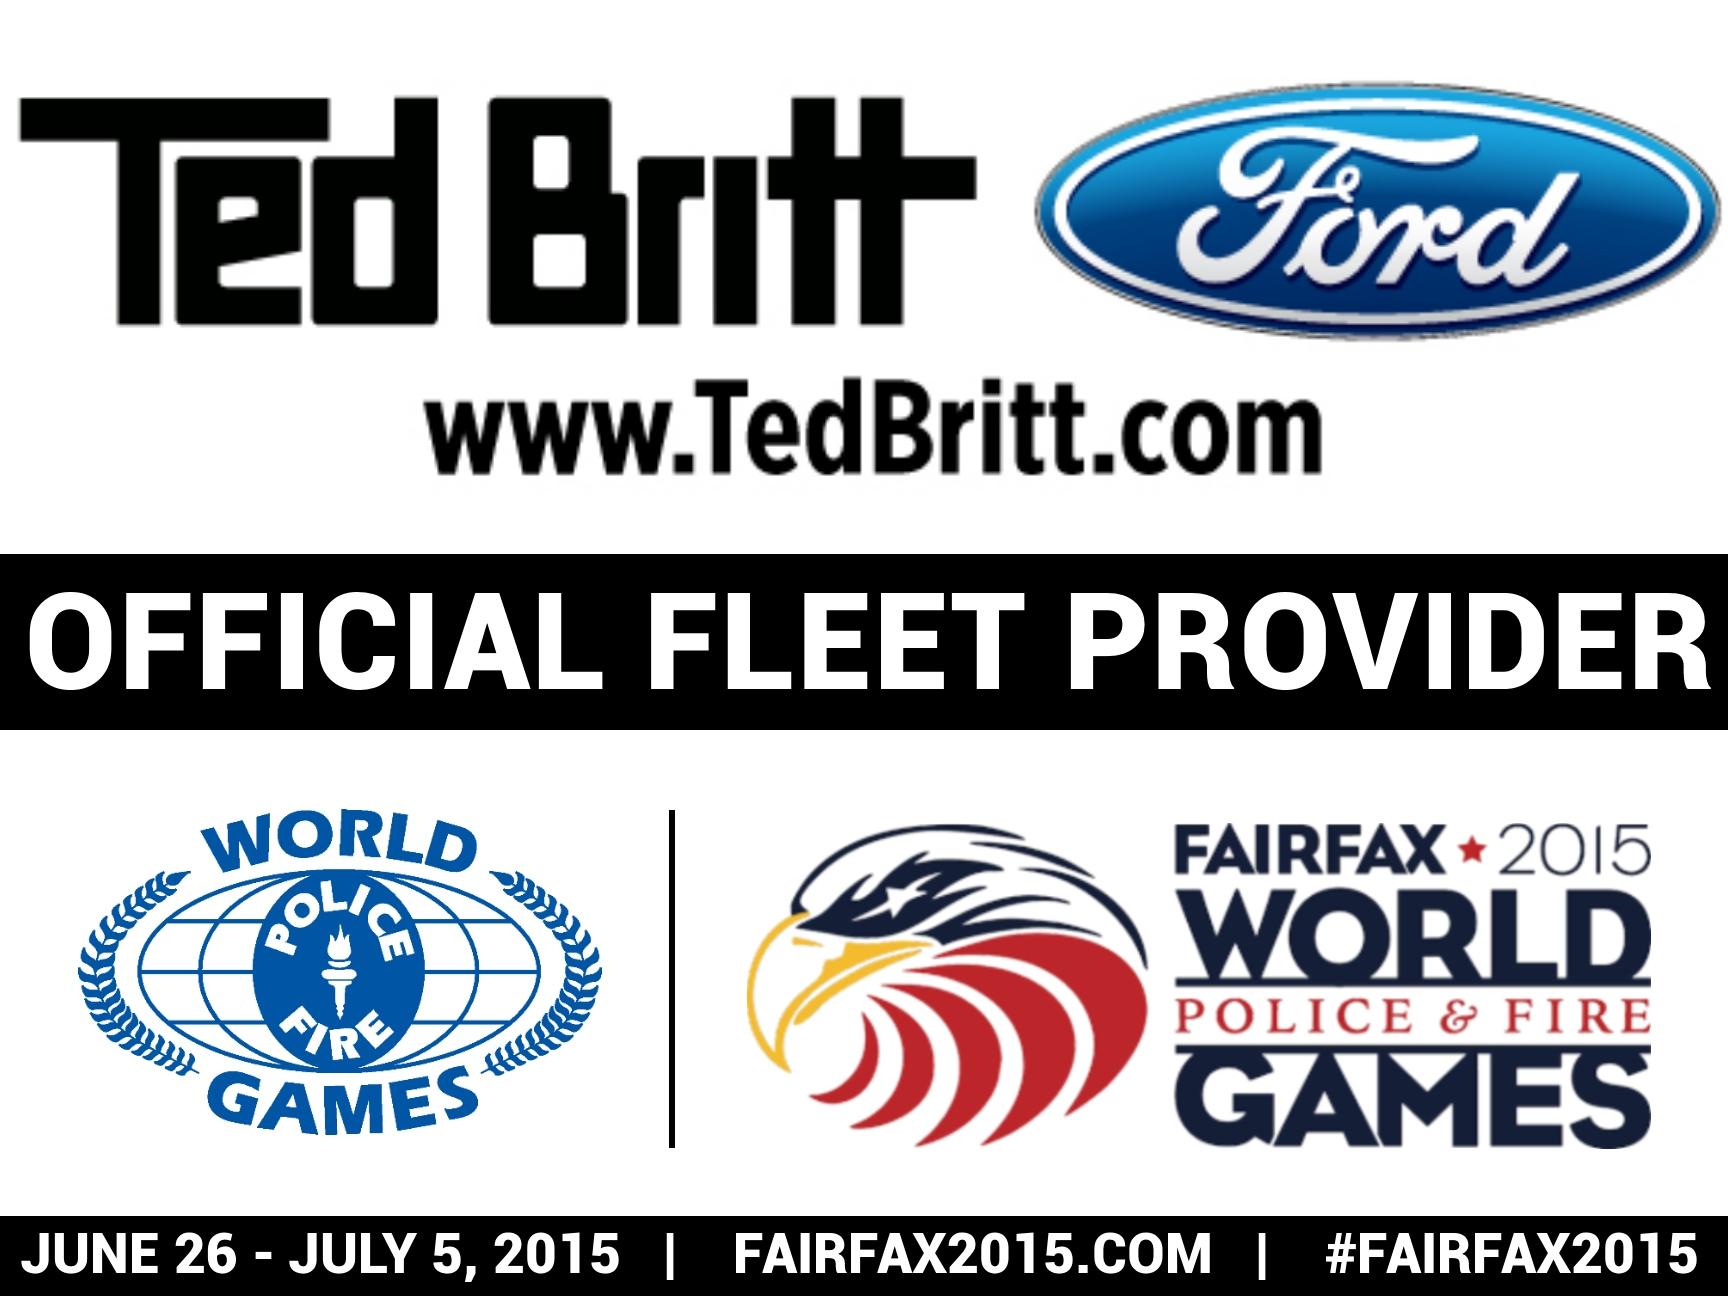 Official Fleet Provider Logo, Ted Britt Ford